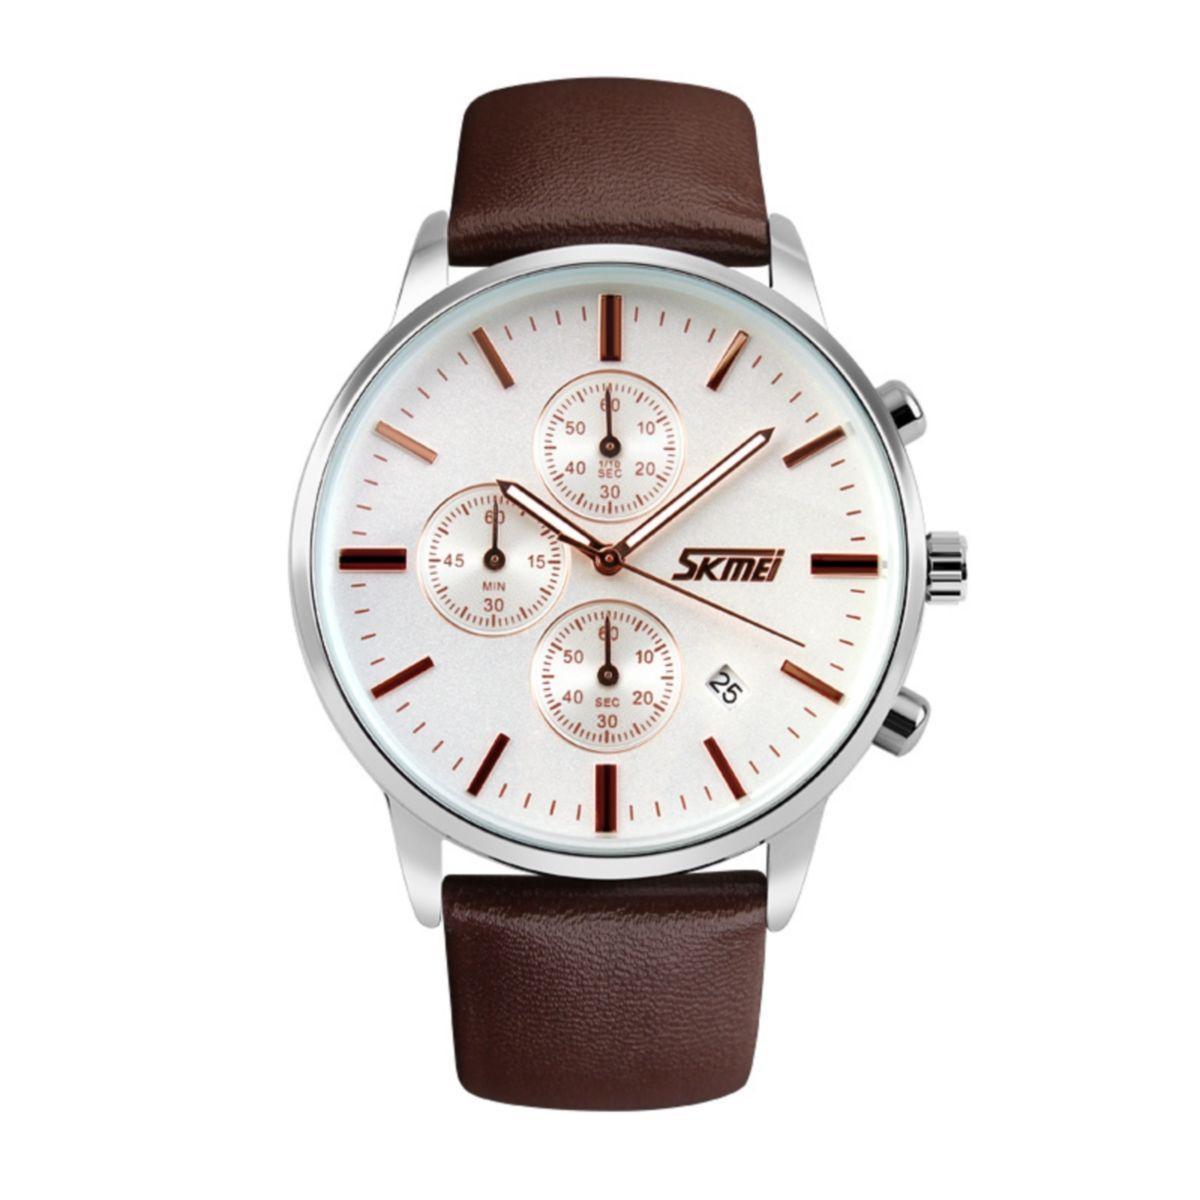 Часы Skmei 9103 White Dail Coffe Strap BOX (9103BOXWCFS)